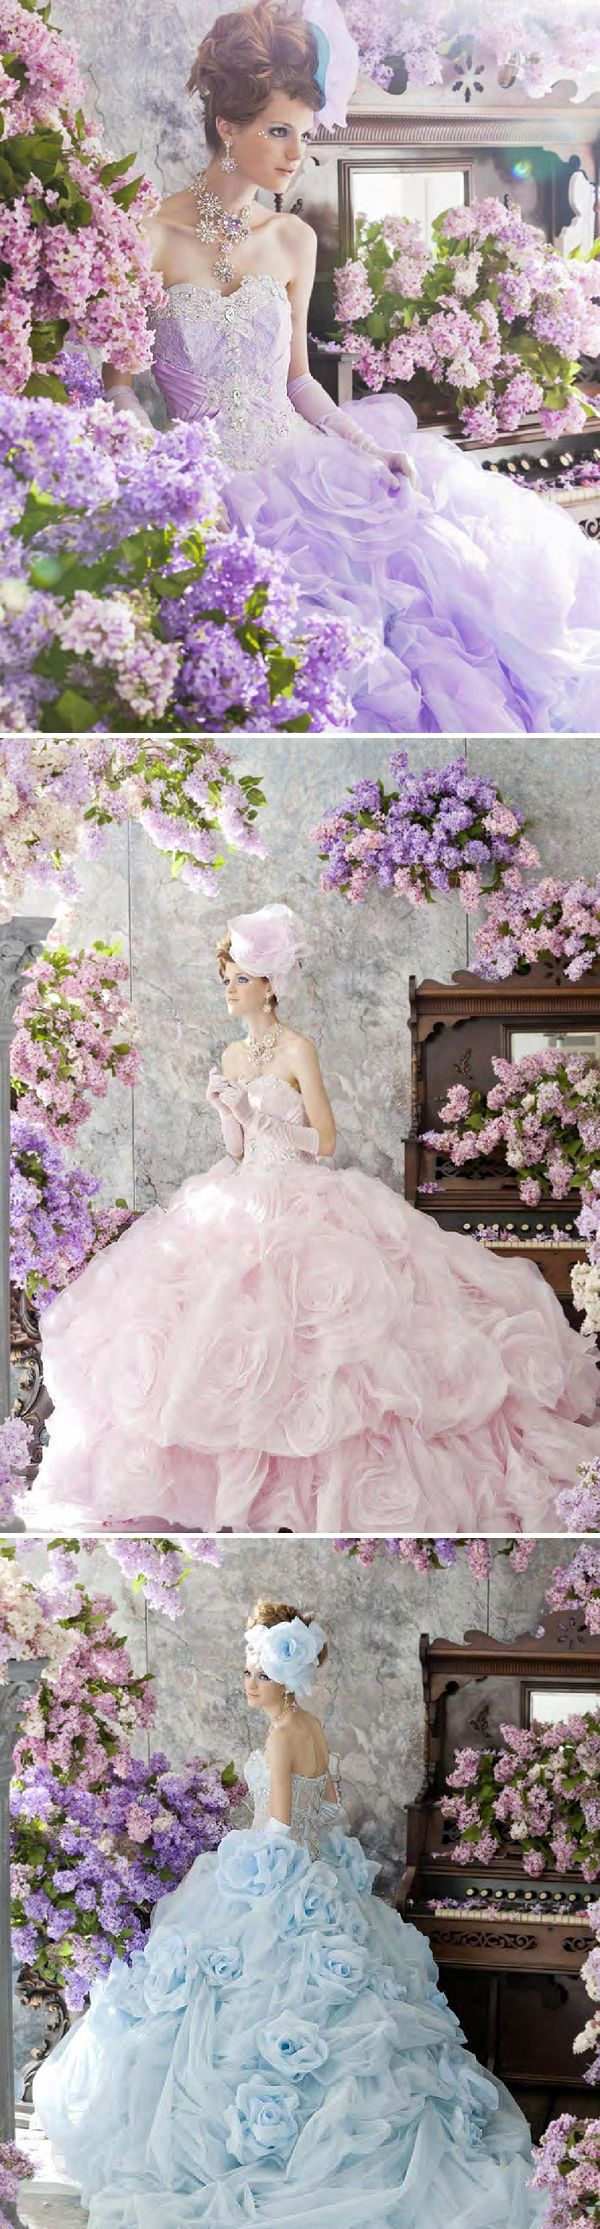 21 Adorable Princess Gowns - Stella De Libero